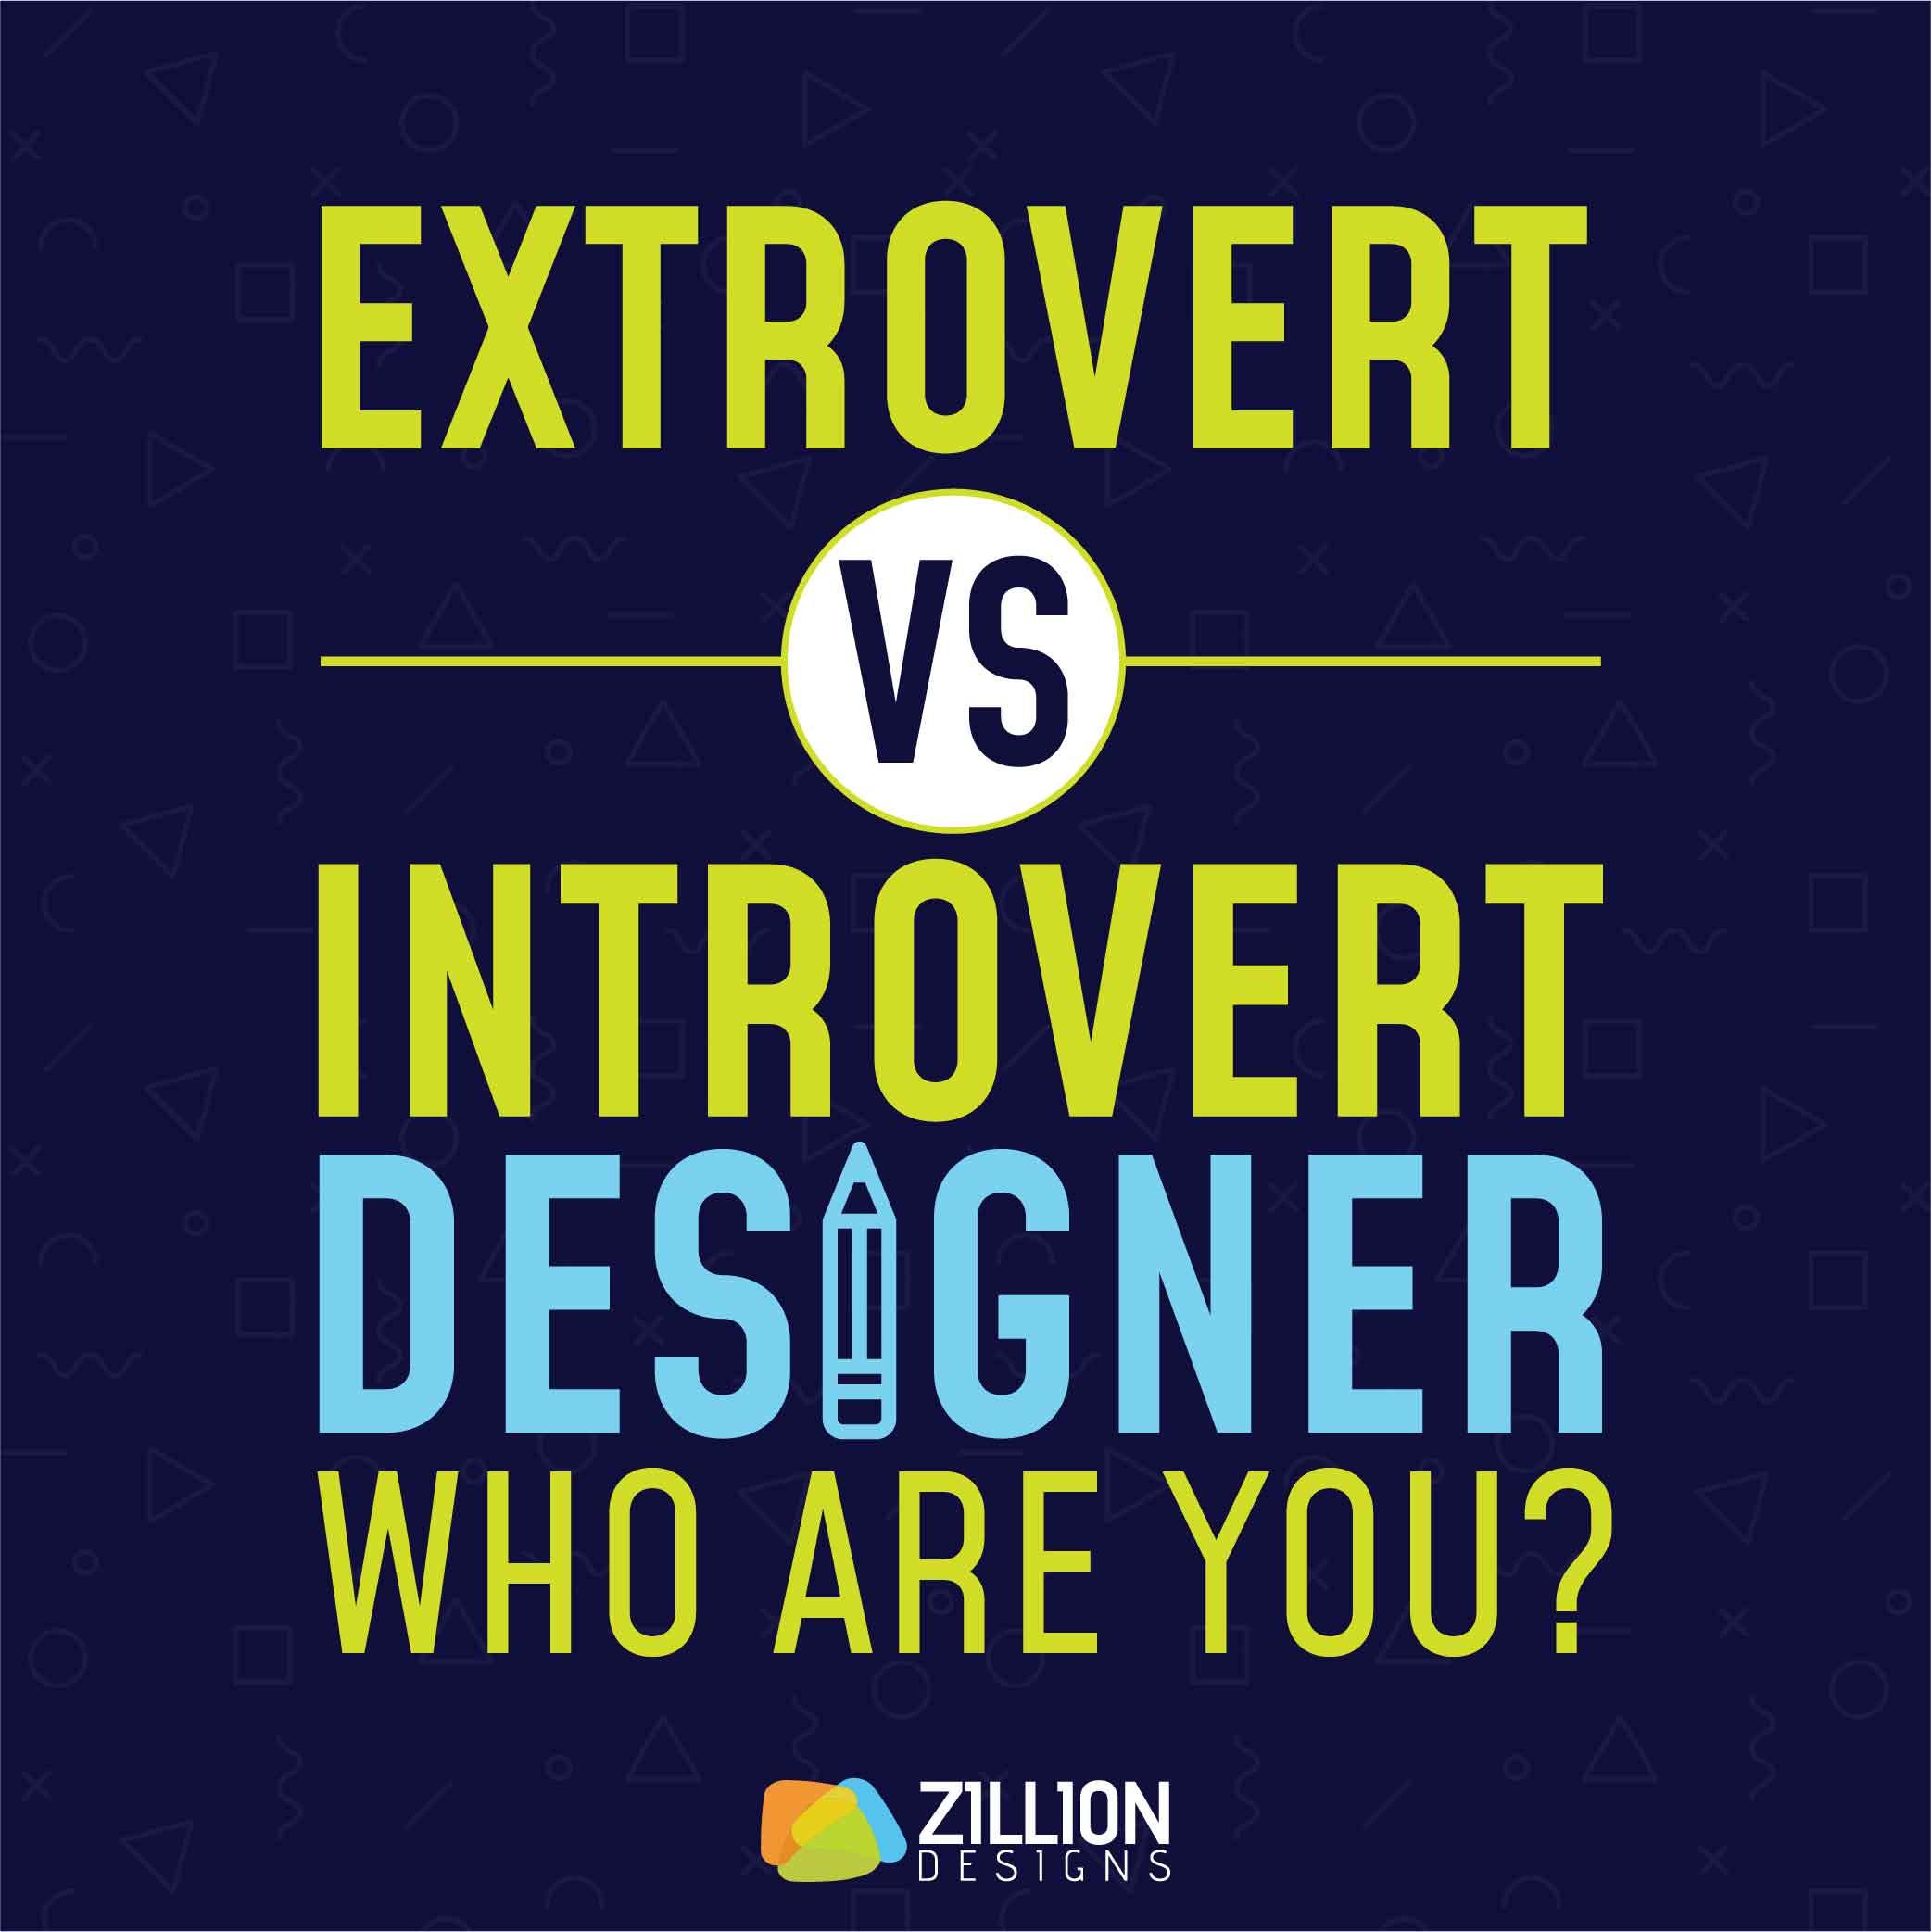 Extrovert vs Introvert Designers 1